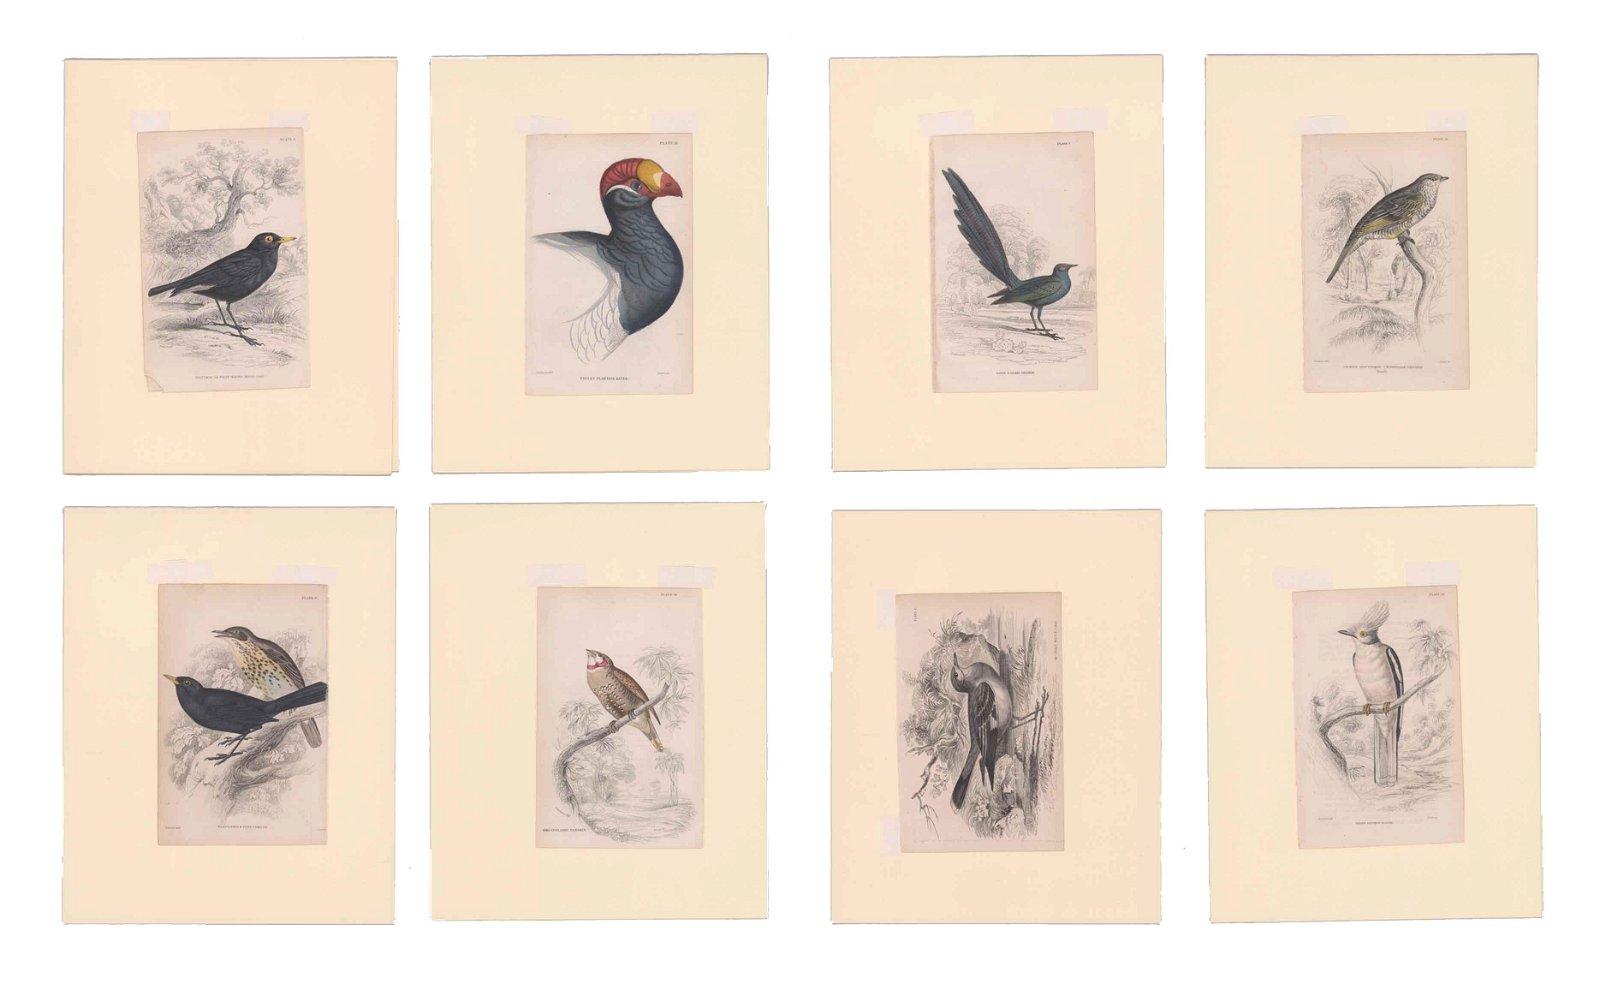 Lizars, Swainson, Jardine Prints [Birds]